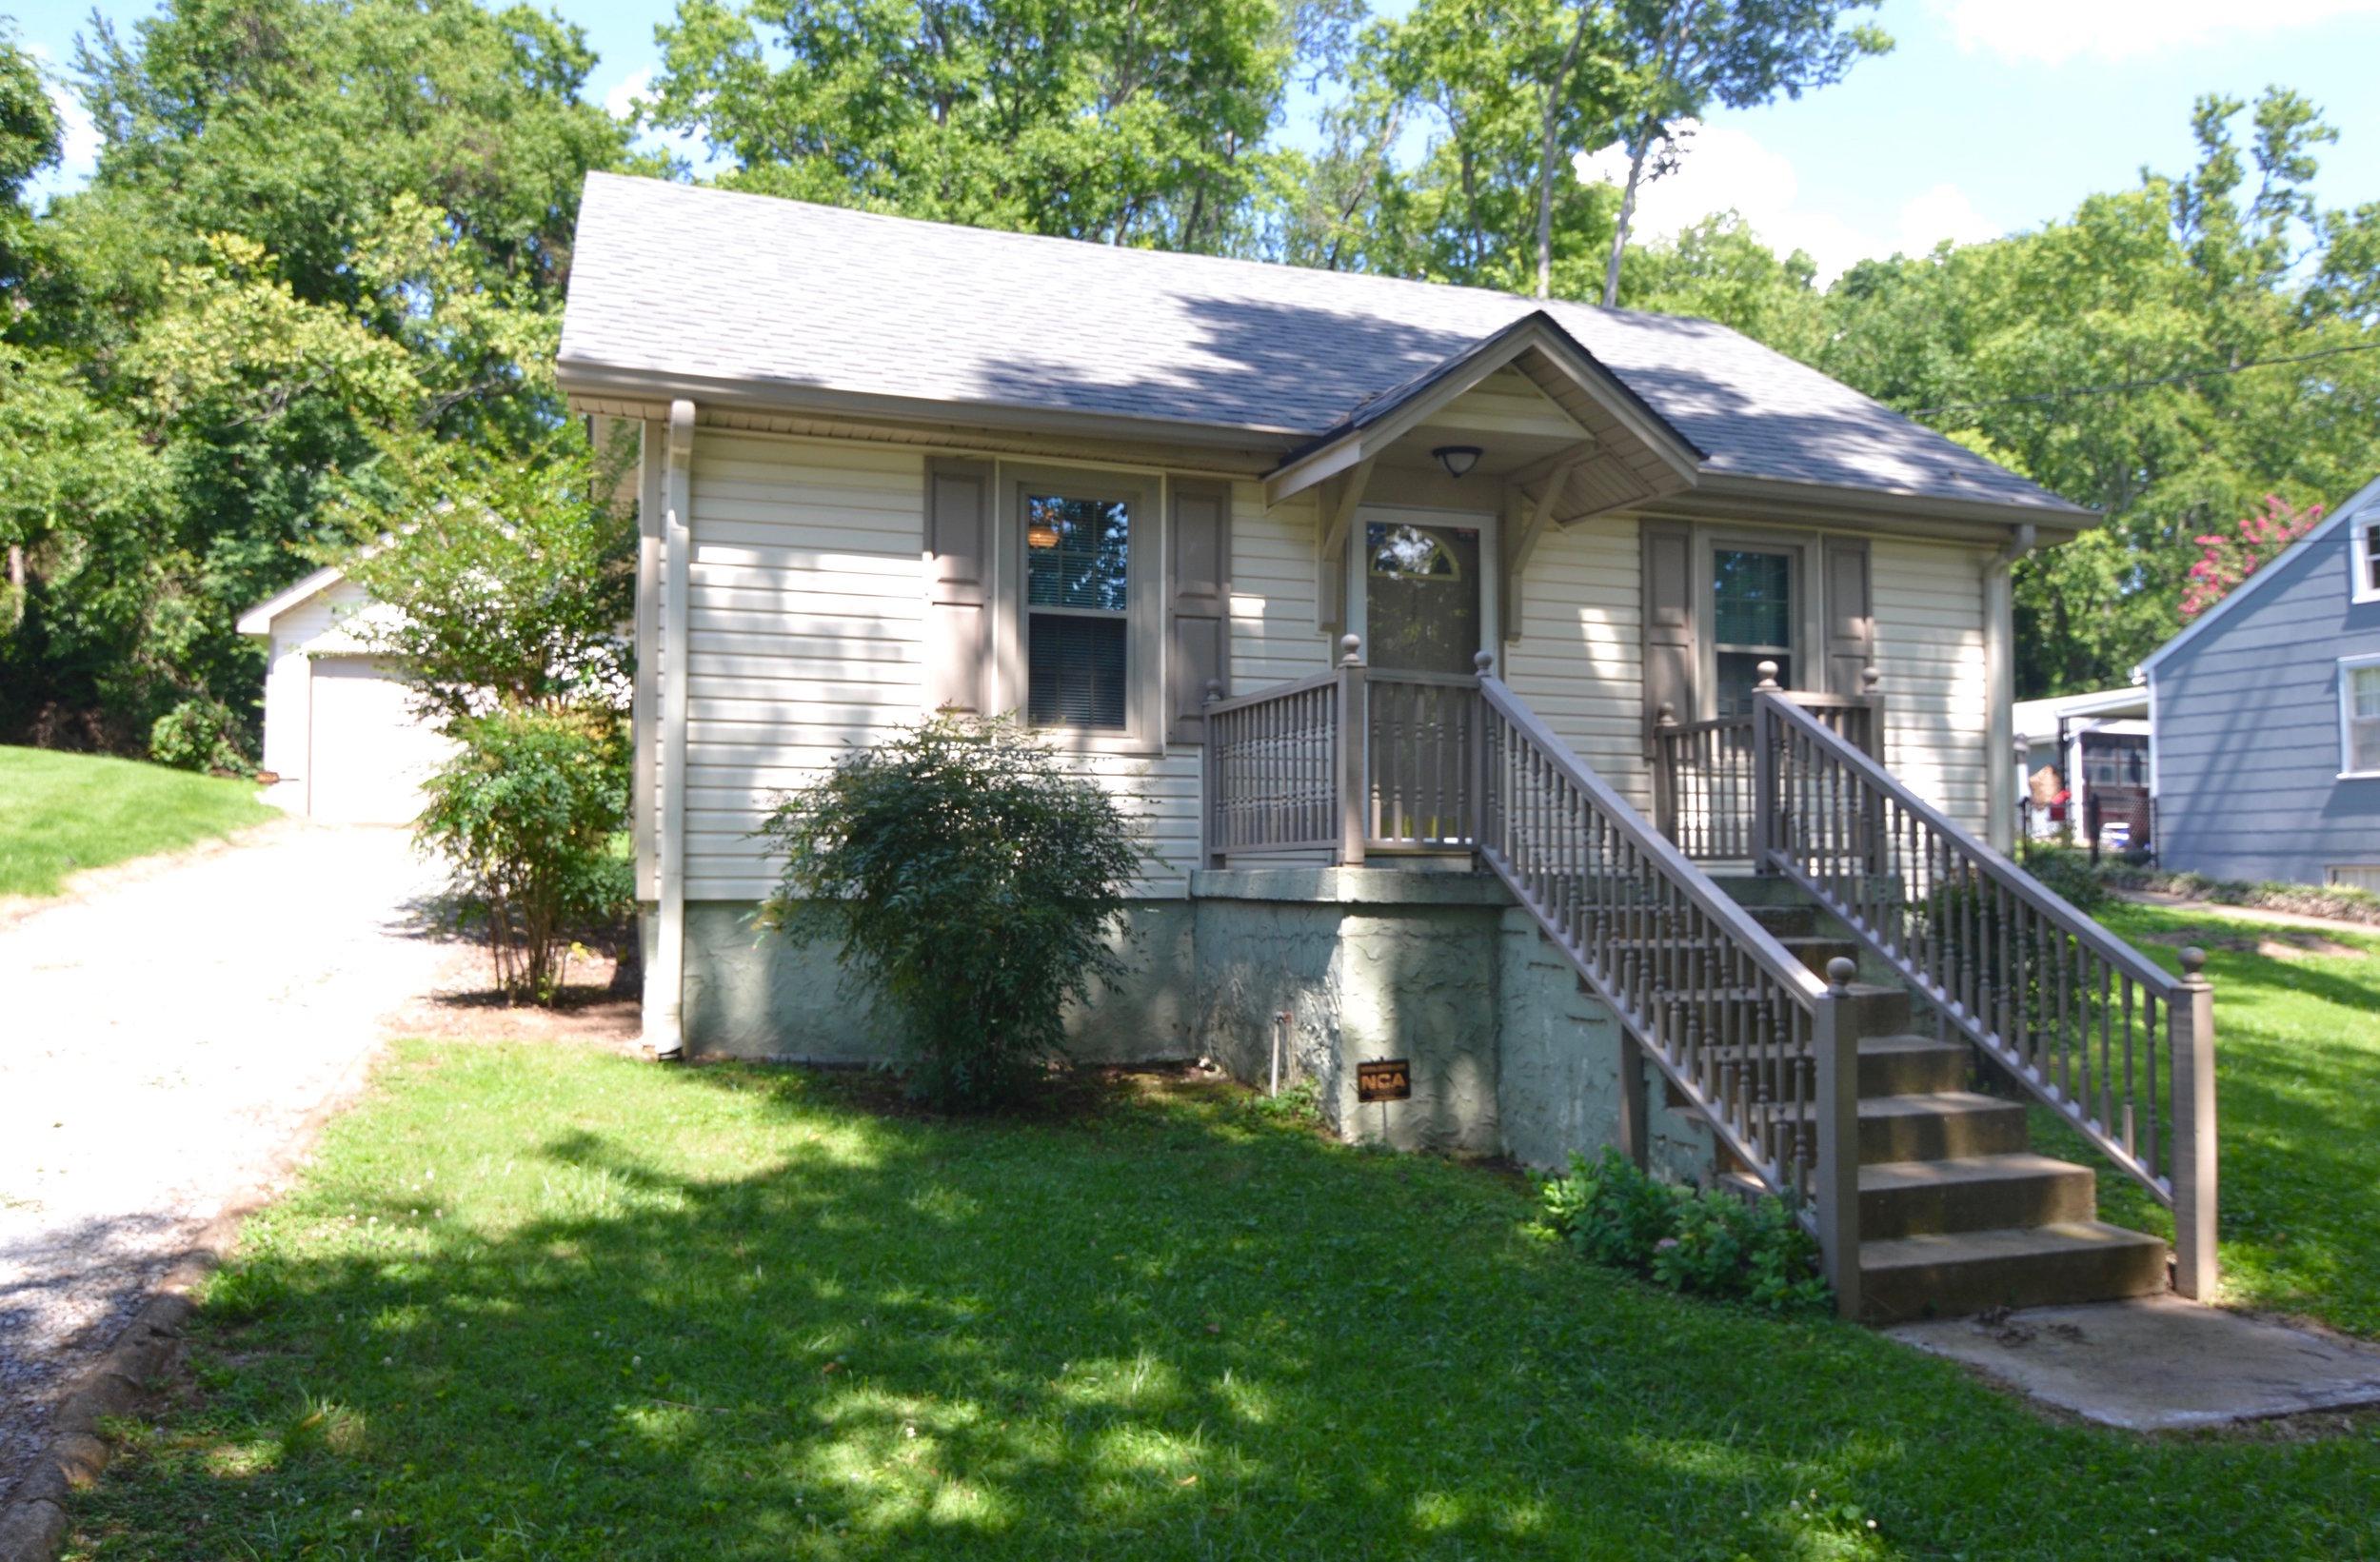 1417 Ardee RENTED   INGLEWOOD: Single Family Home:  2 Br 1 Ba + Garage + Fenced